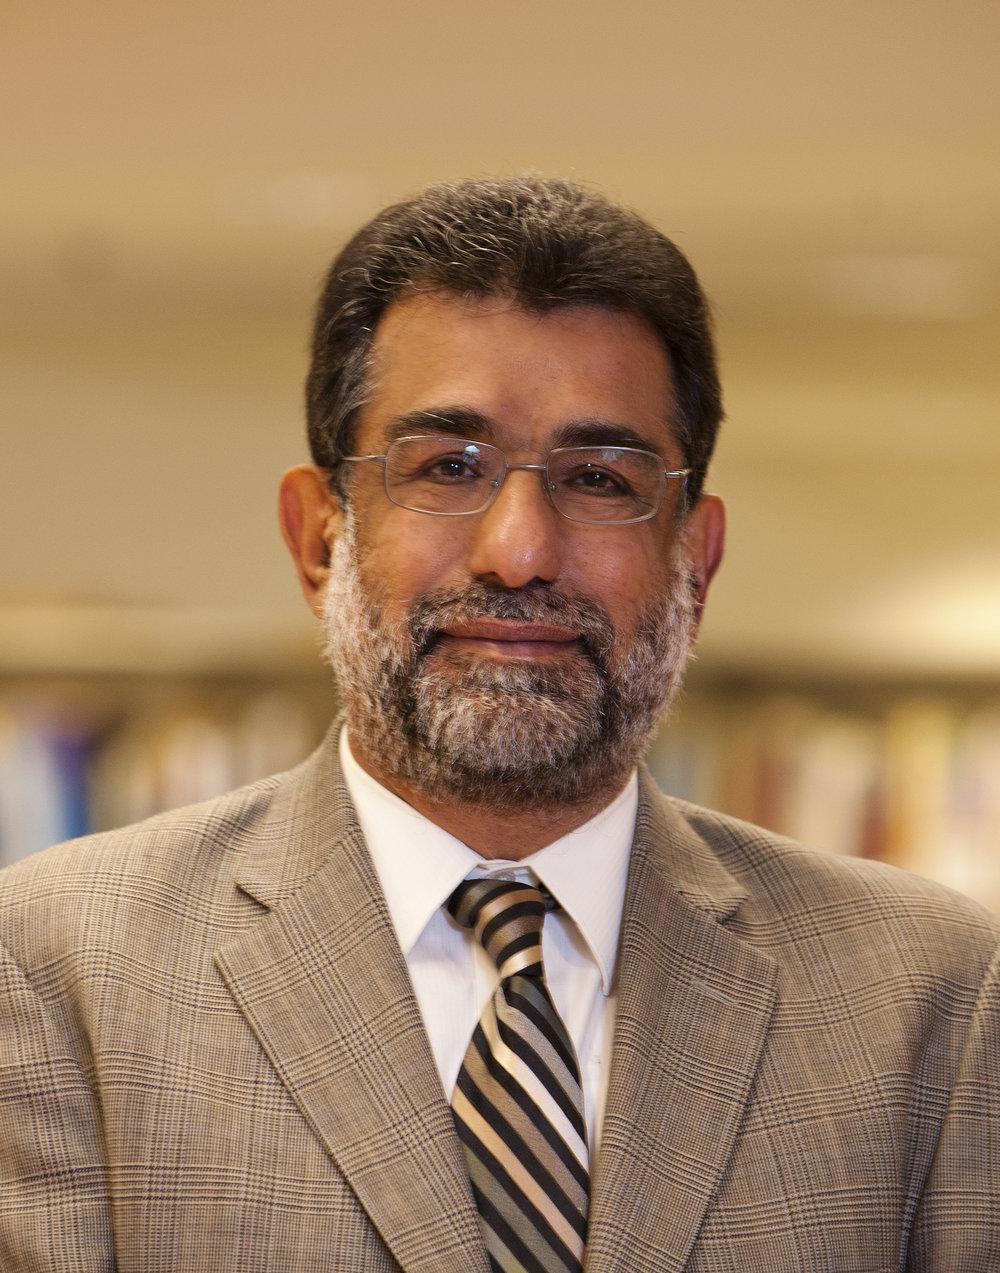 Dr. Qassim Abdullah